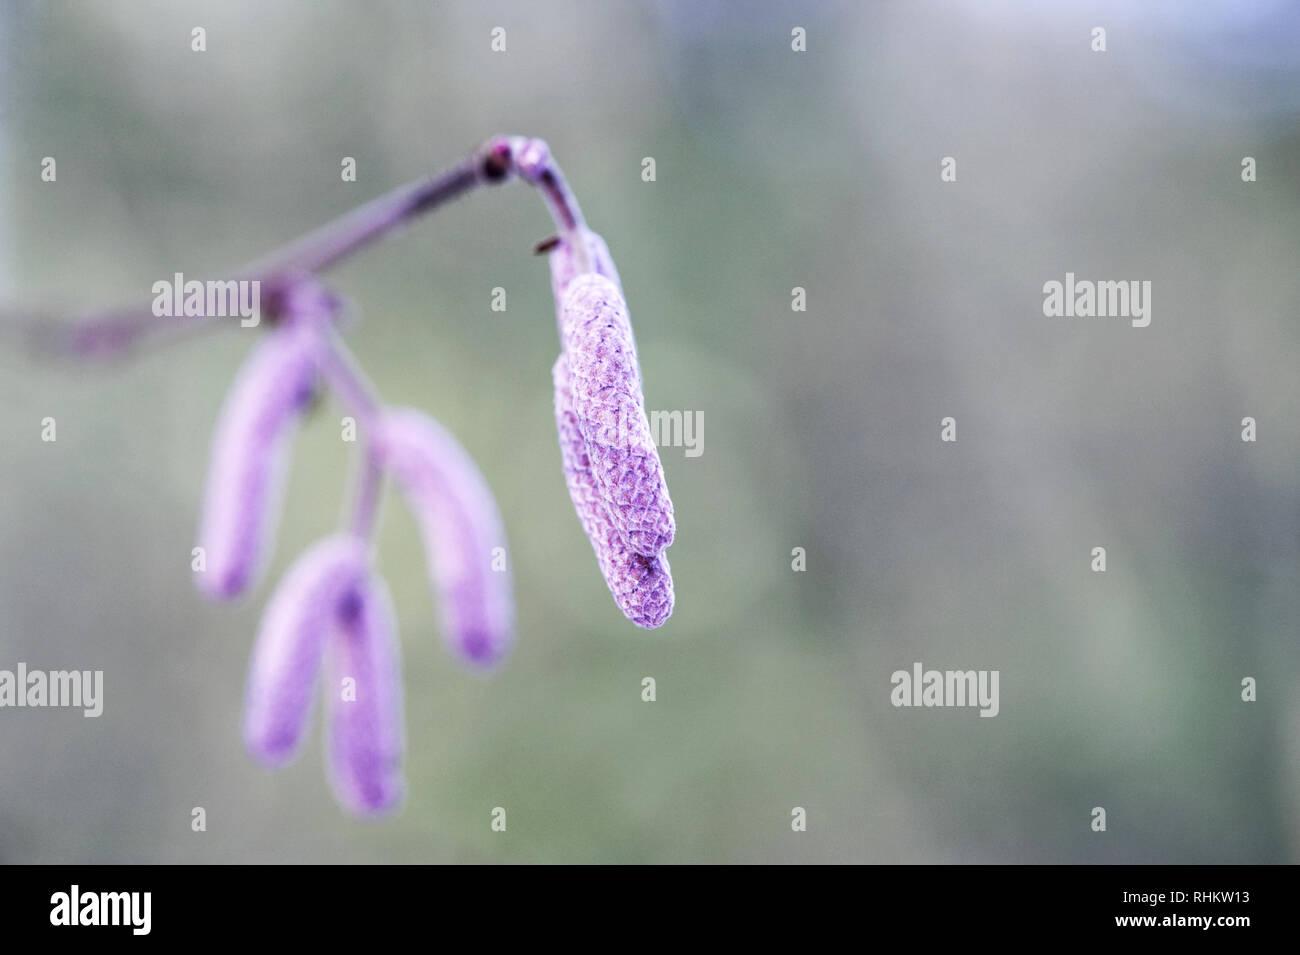 Corylus maxima 'Purpurea' catkins in Winter. - Stock Image